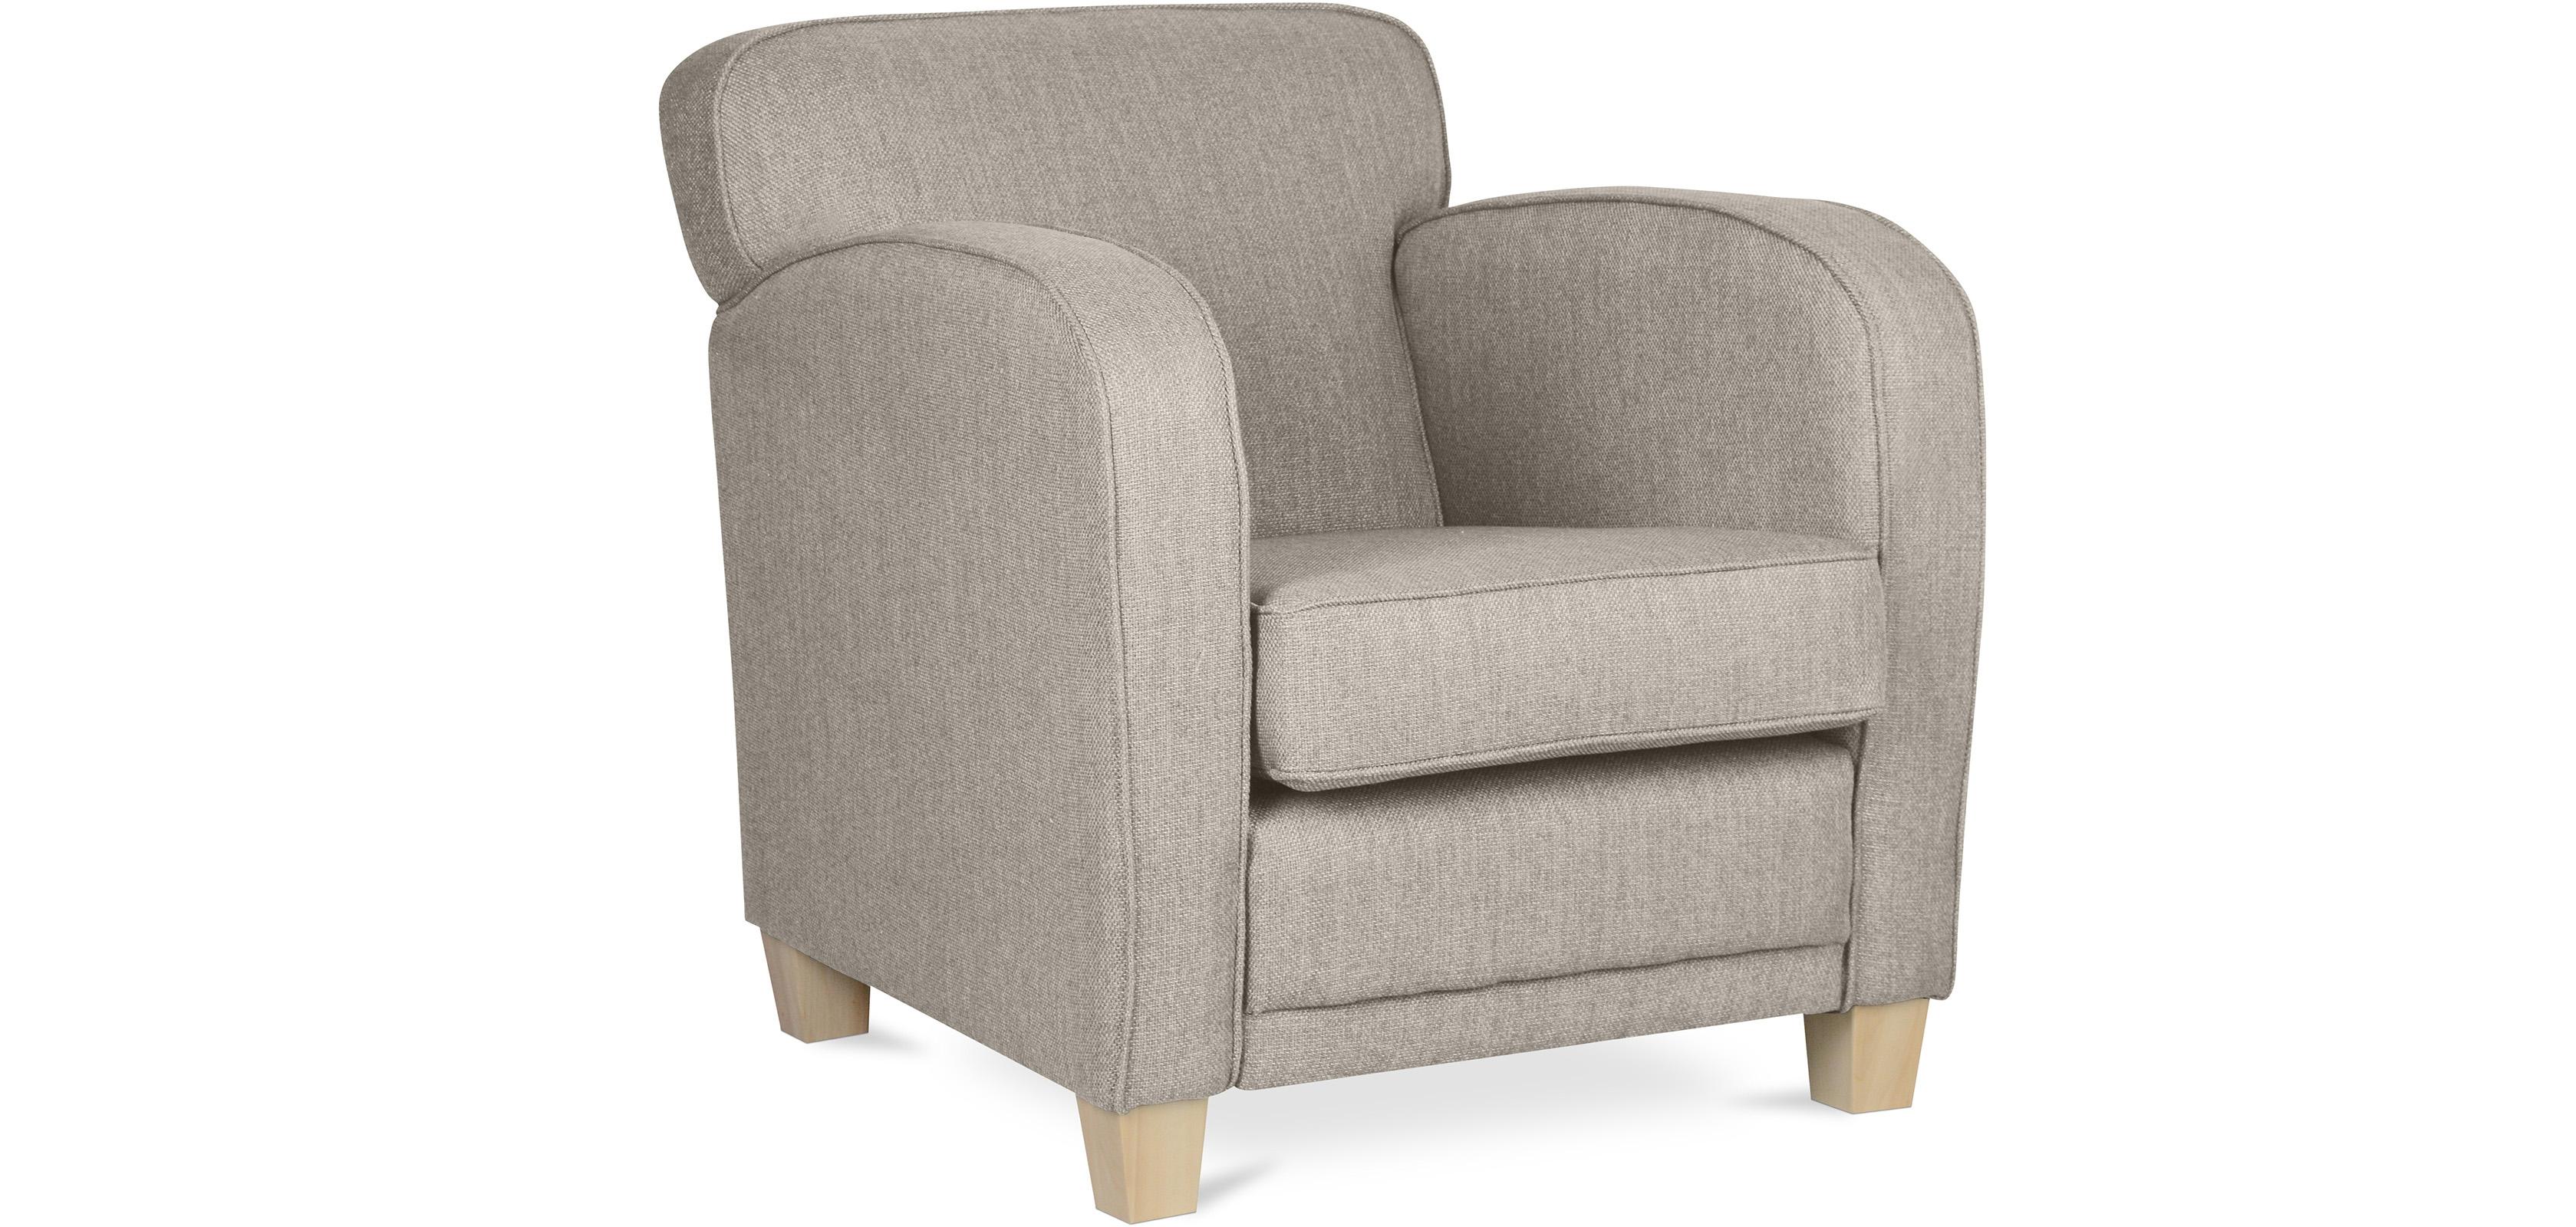 Buy Isabella Scandinavian style armchair - Fabric Ivory ...